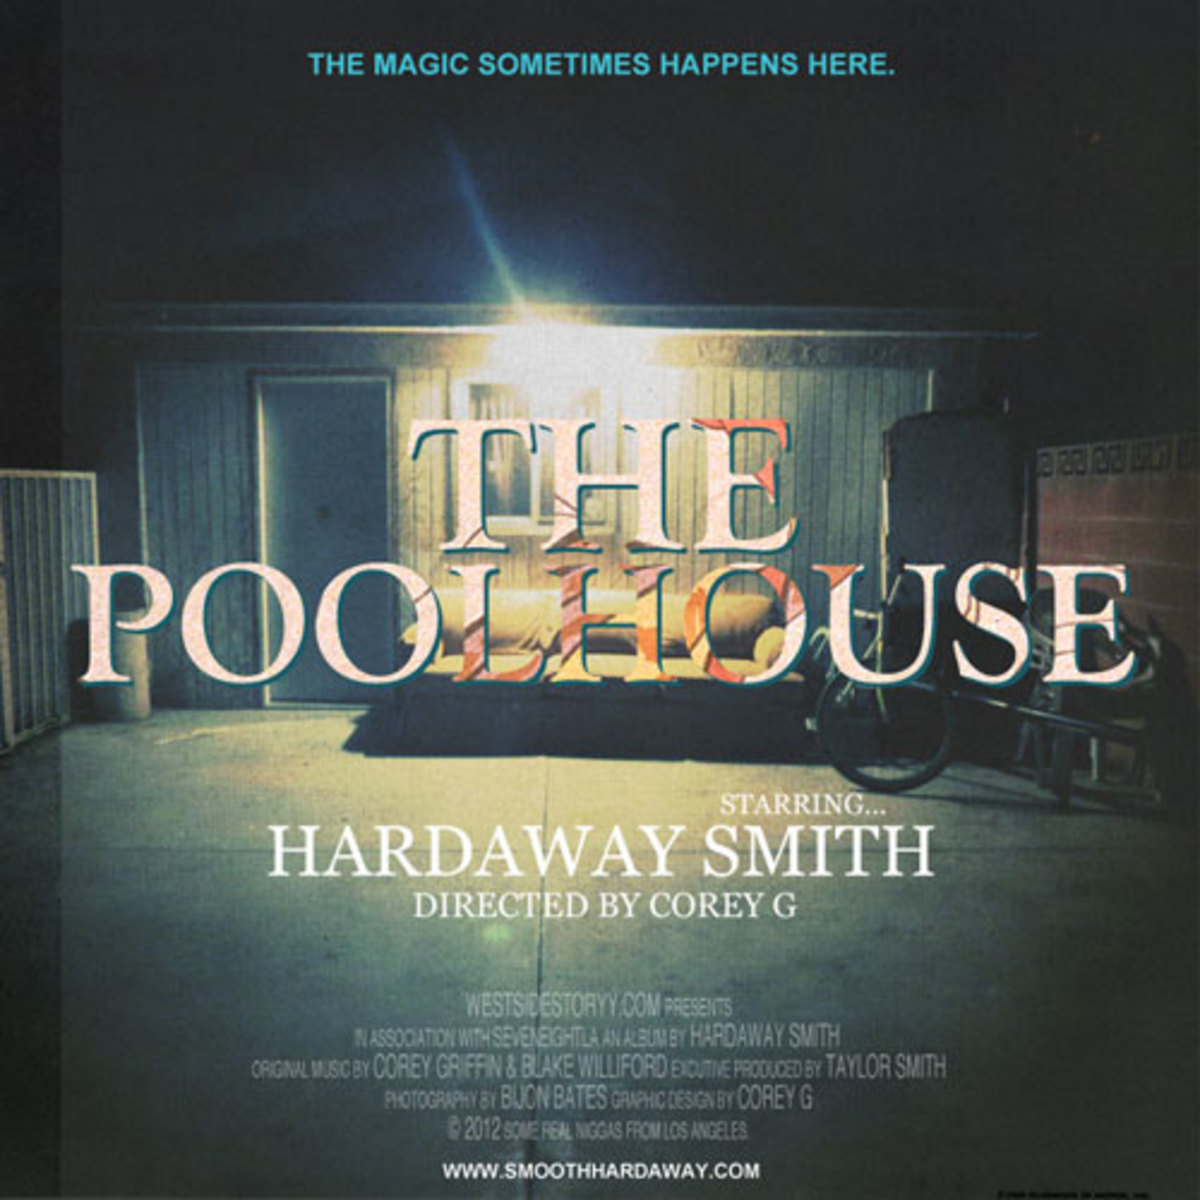 hardawaysmith-poolhouse.jpg